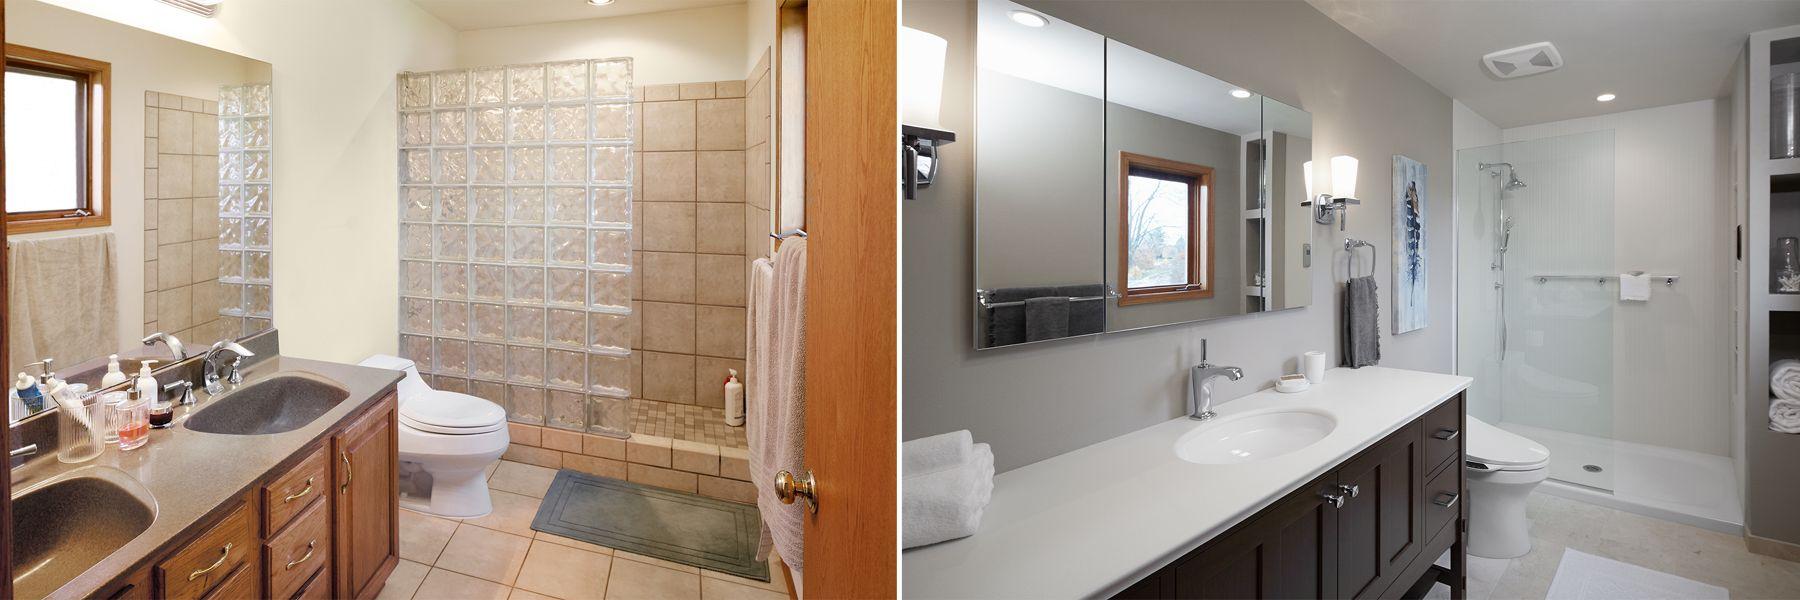 Bathroom Ideas & Planning